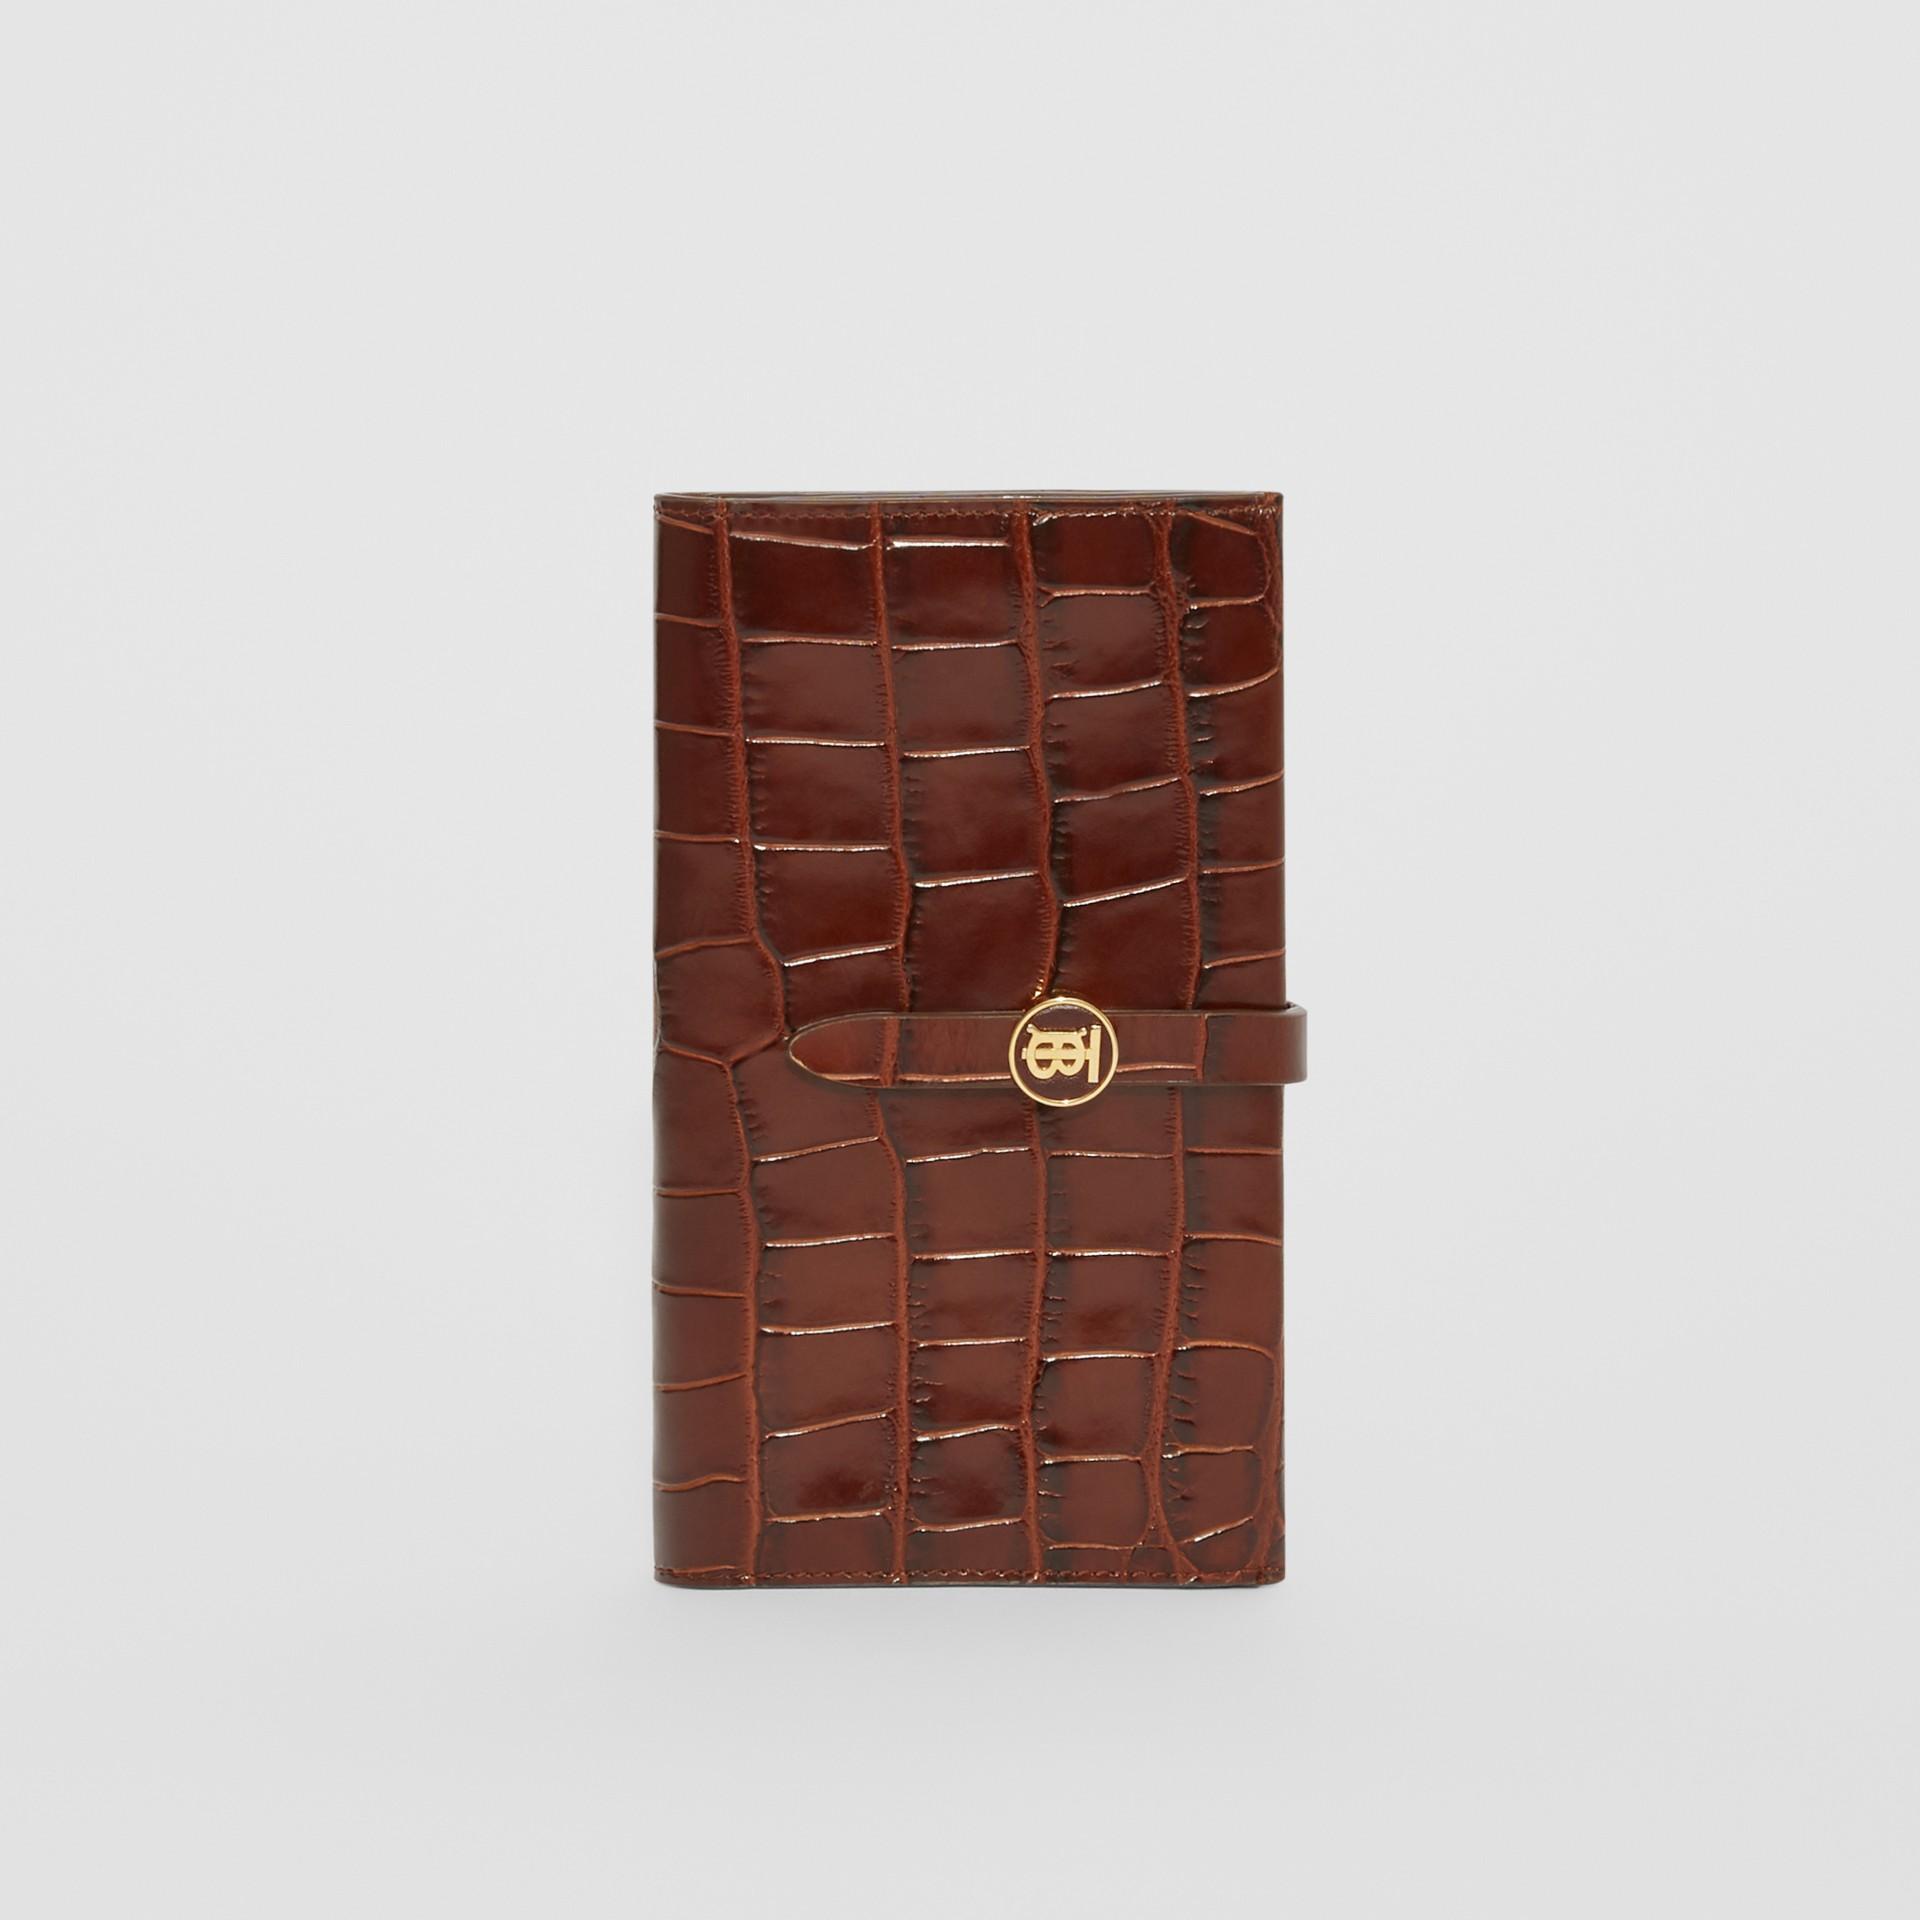 Monogram Motif Embossed Leather Folding Wallet in Tan - Women | Burberry - gallery image 6